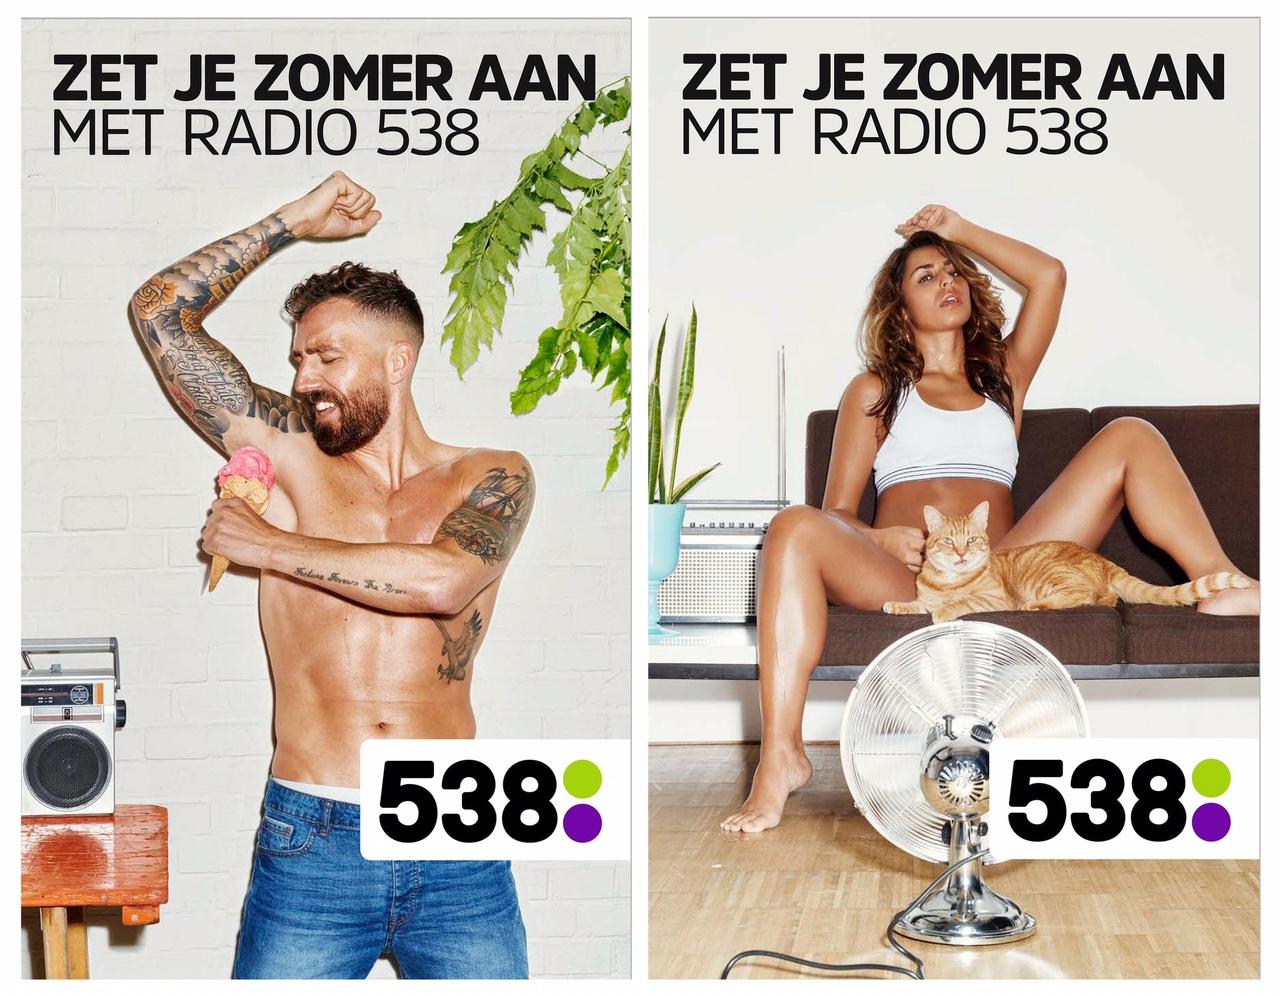 dating site reclame radio 538 live